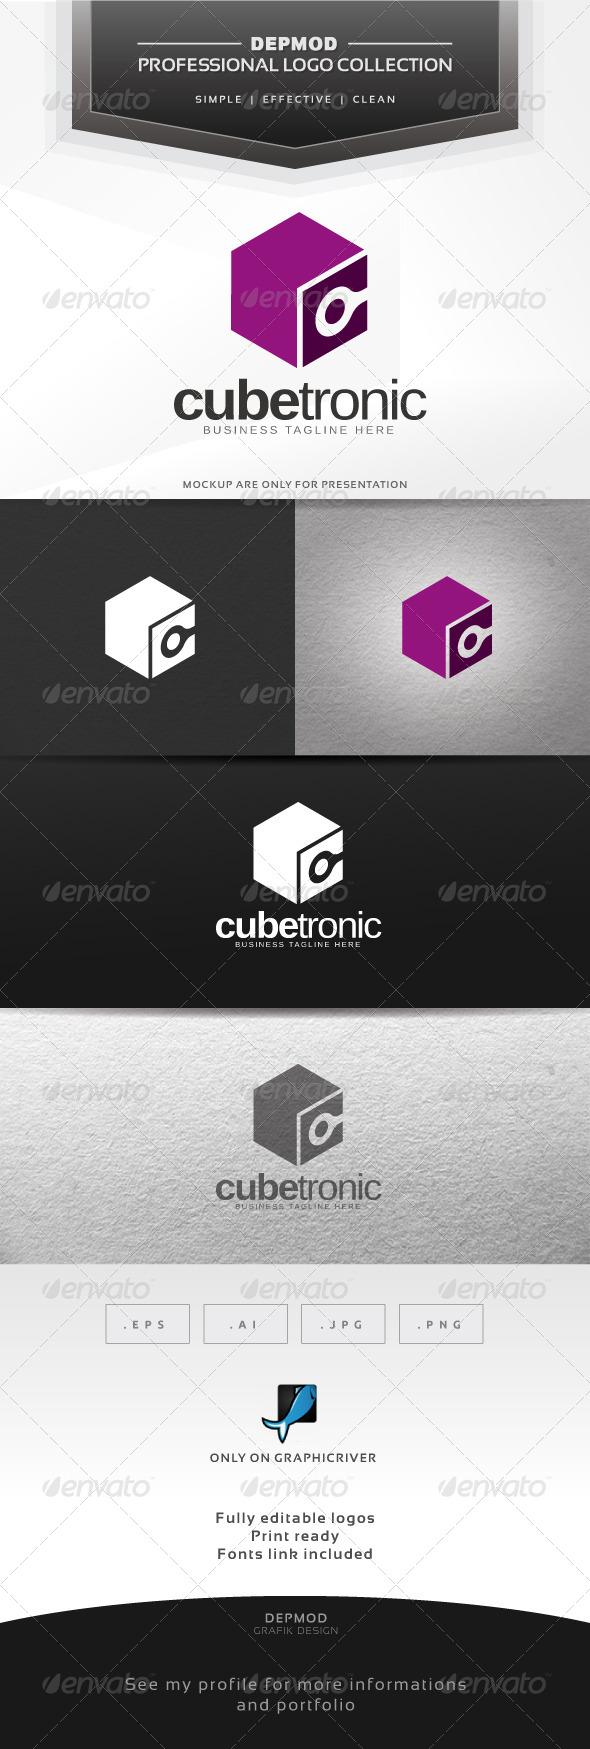 Cube Tronic Logo - Abstract Logo Templates